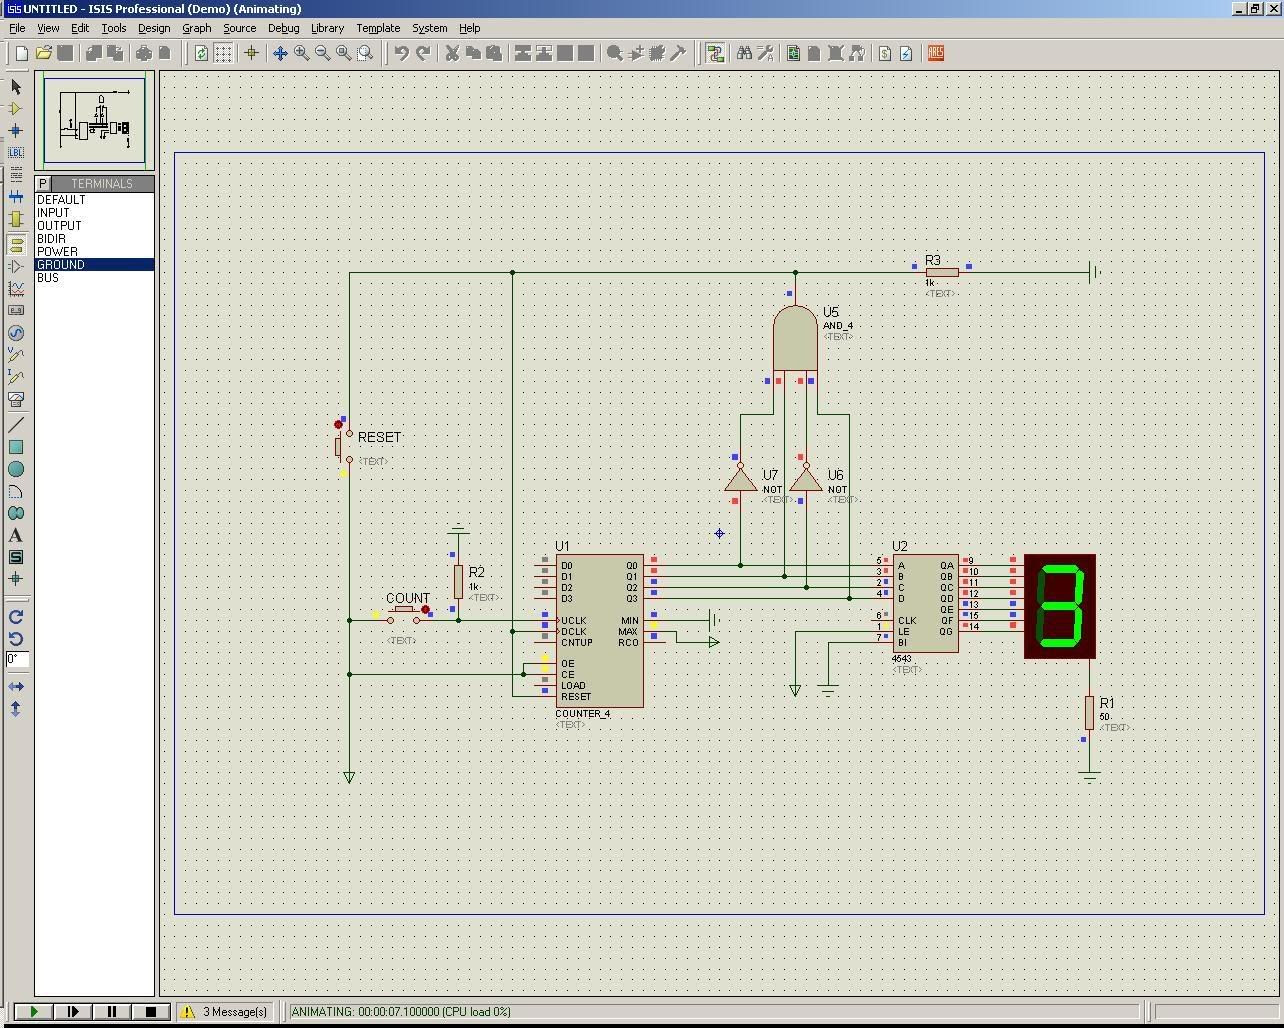 Free Circuit Simulator Electronics Simulation Software Circuitlab Screenshot Heres An Action Shot Of What Im Talking About